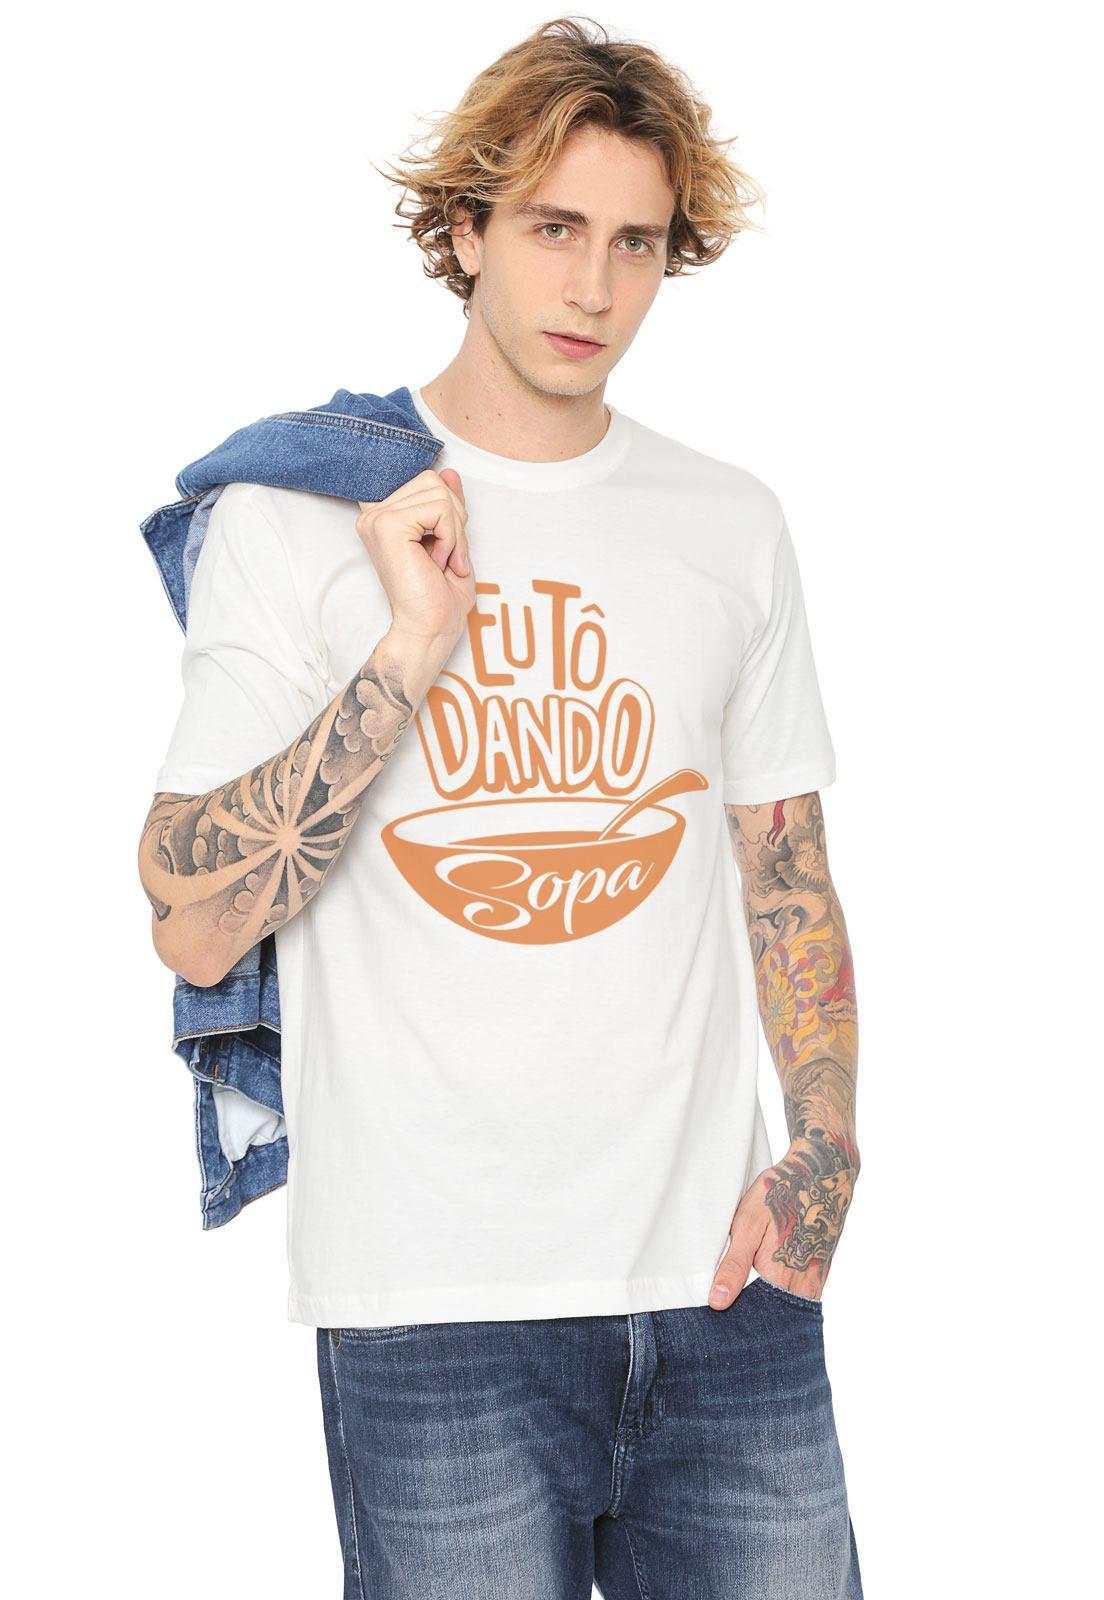 Camiseta Estampada Tô Dando Sopa